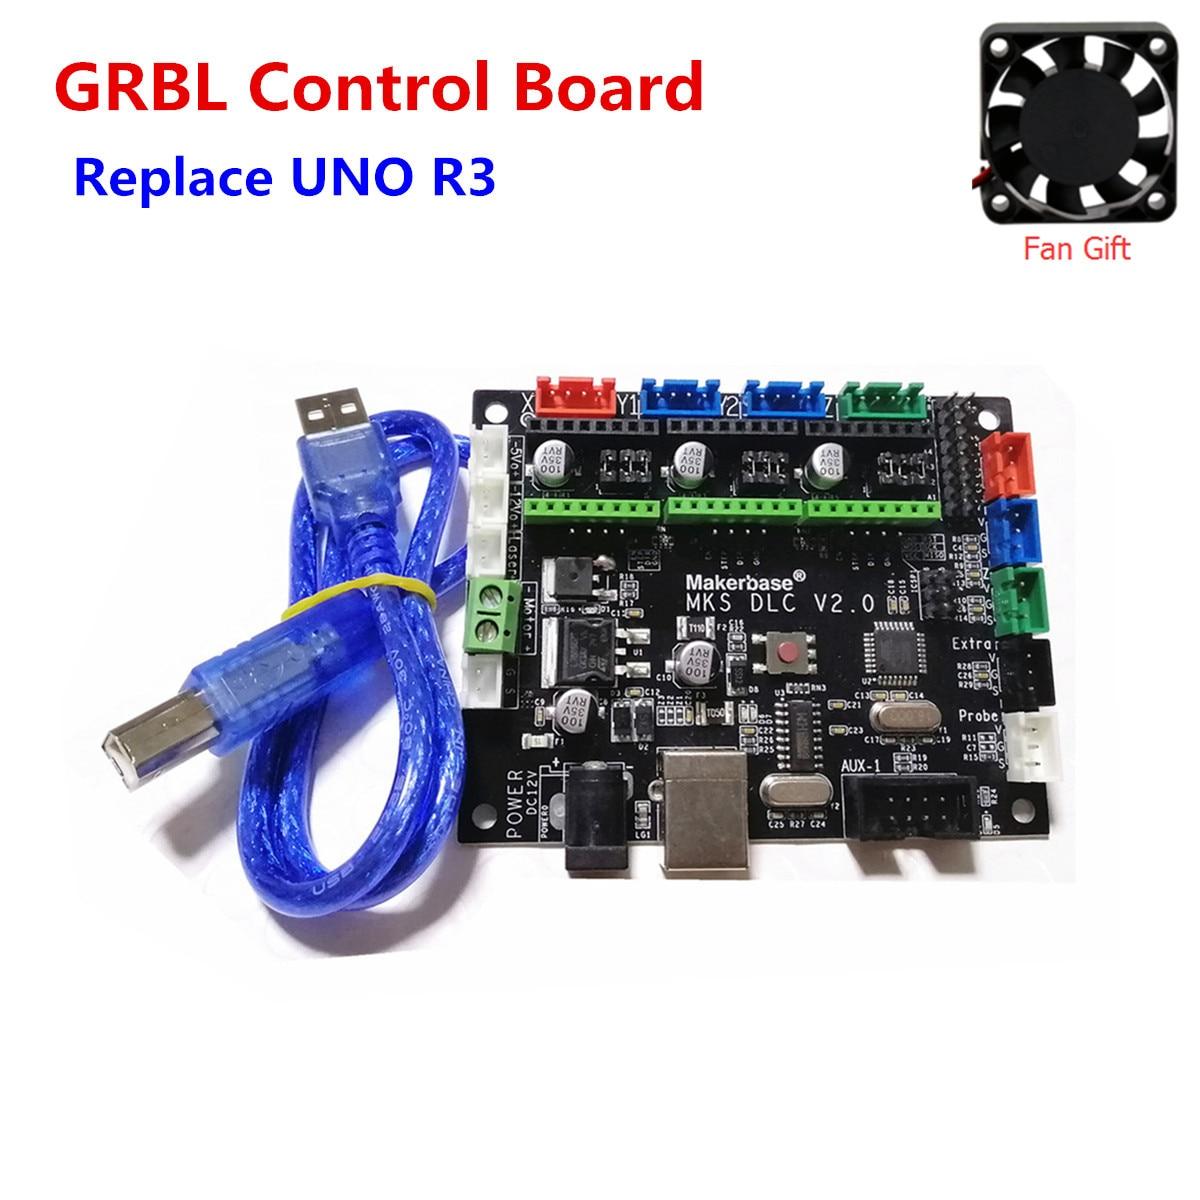 GRBL CNC motherboard TTL control platte 3 achsen stepper laser fahrer breakout board cnc schild v3 expansion board arduino UNO r3